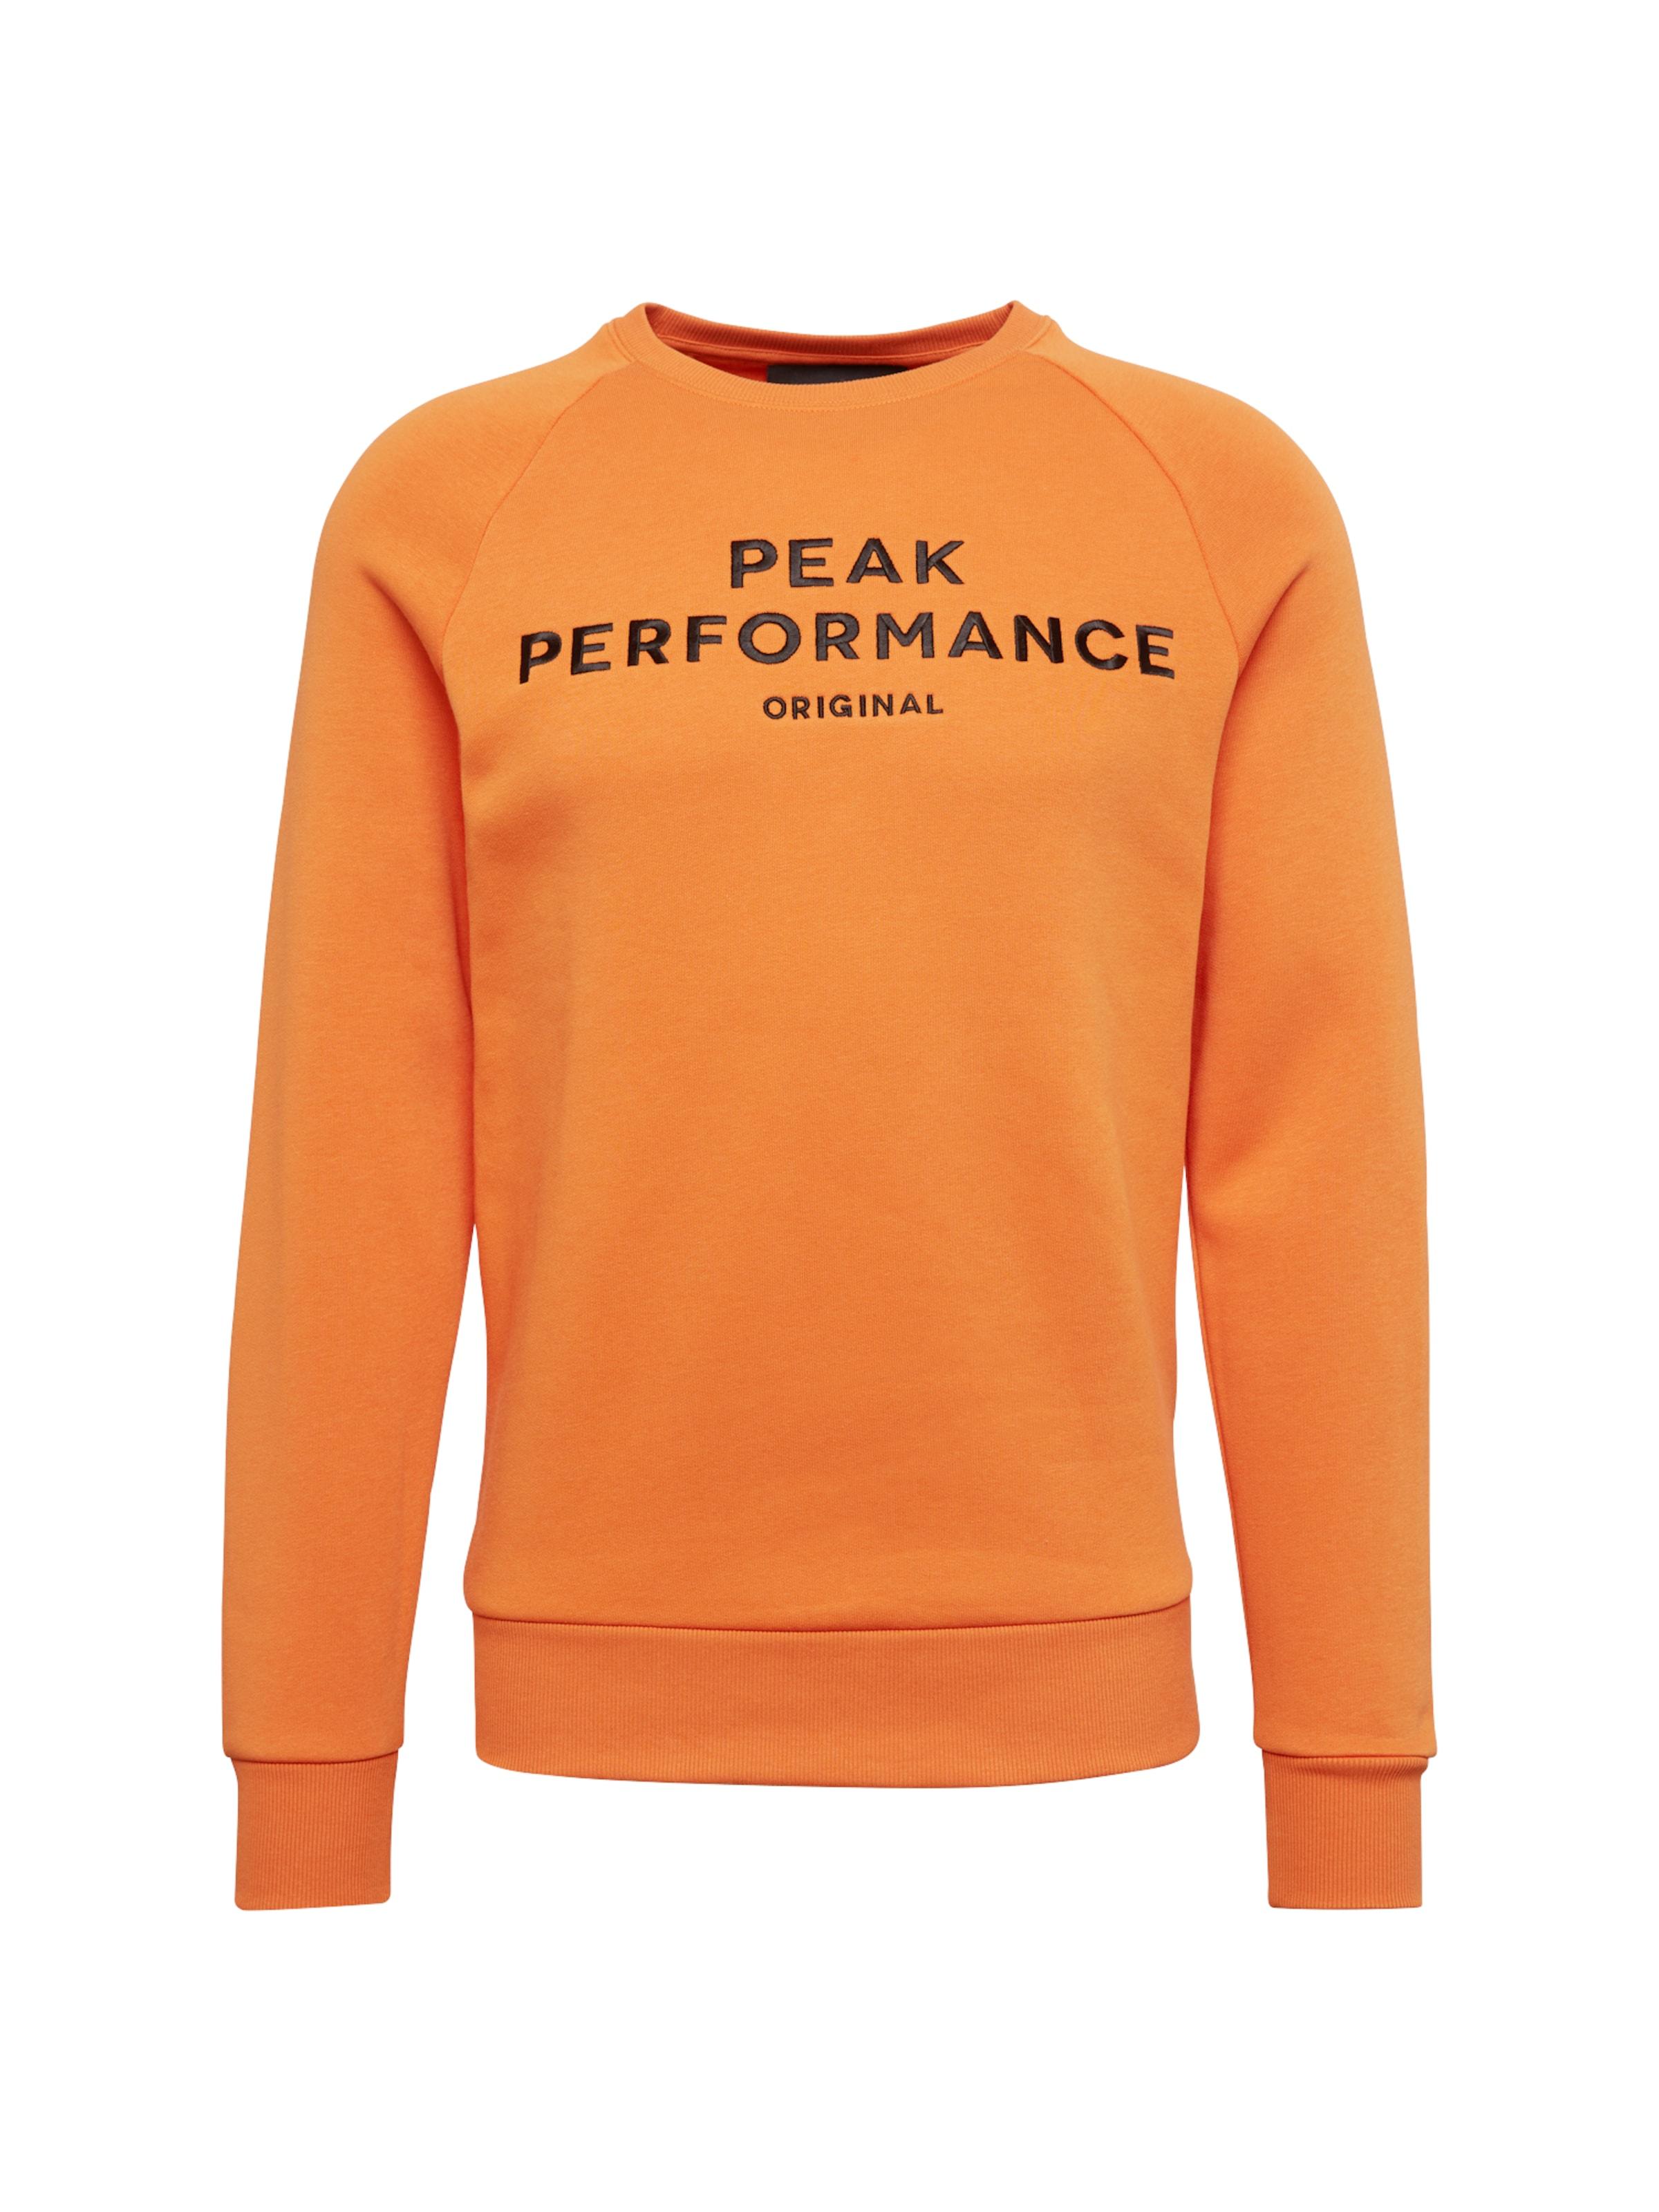 Peak Sweat En shirt Orange Performance Yg76vbfy